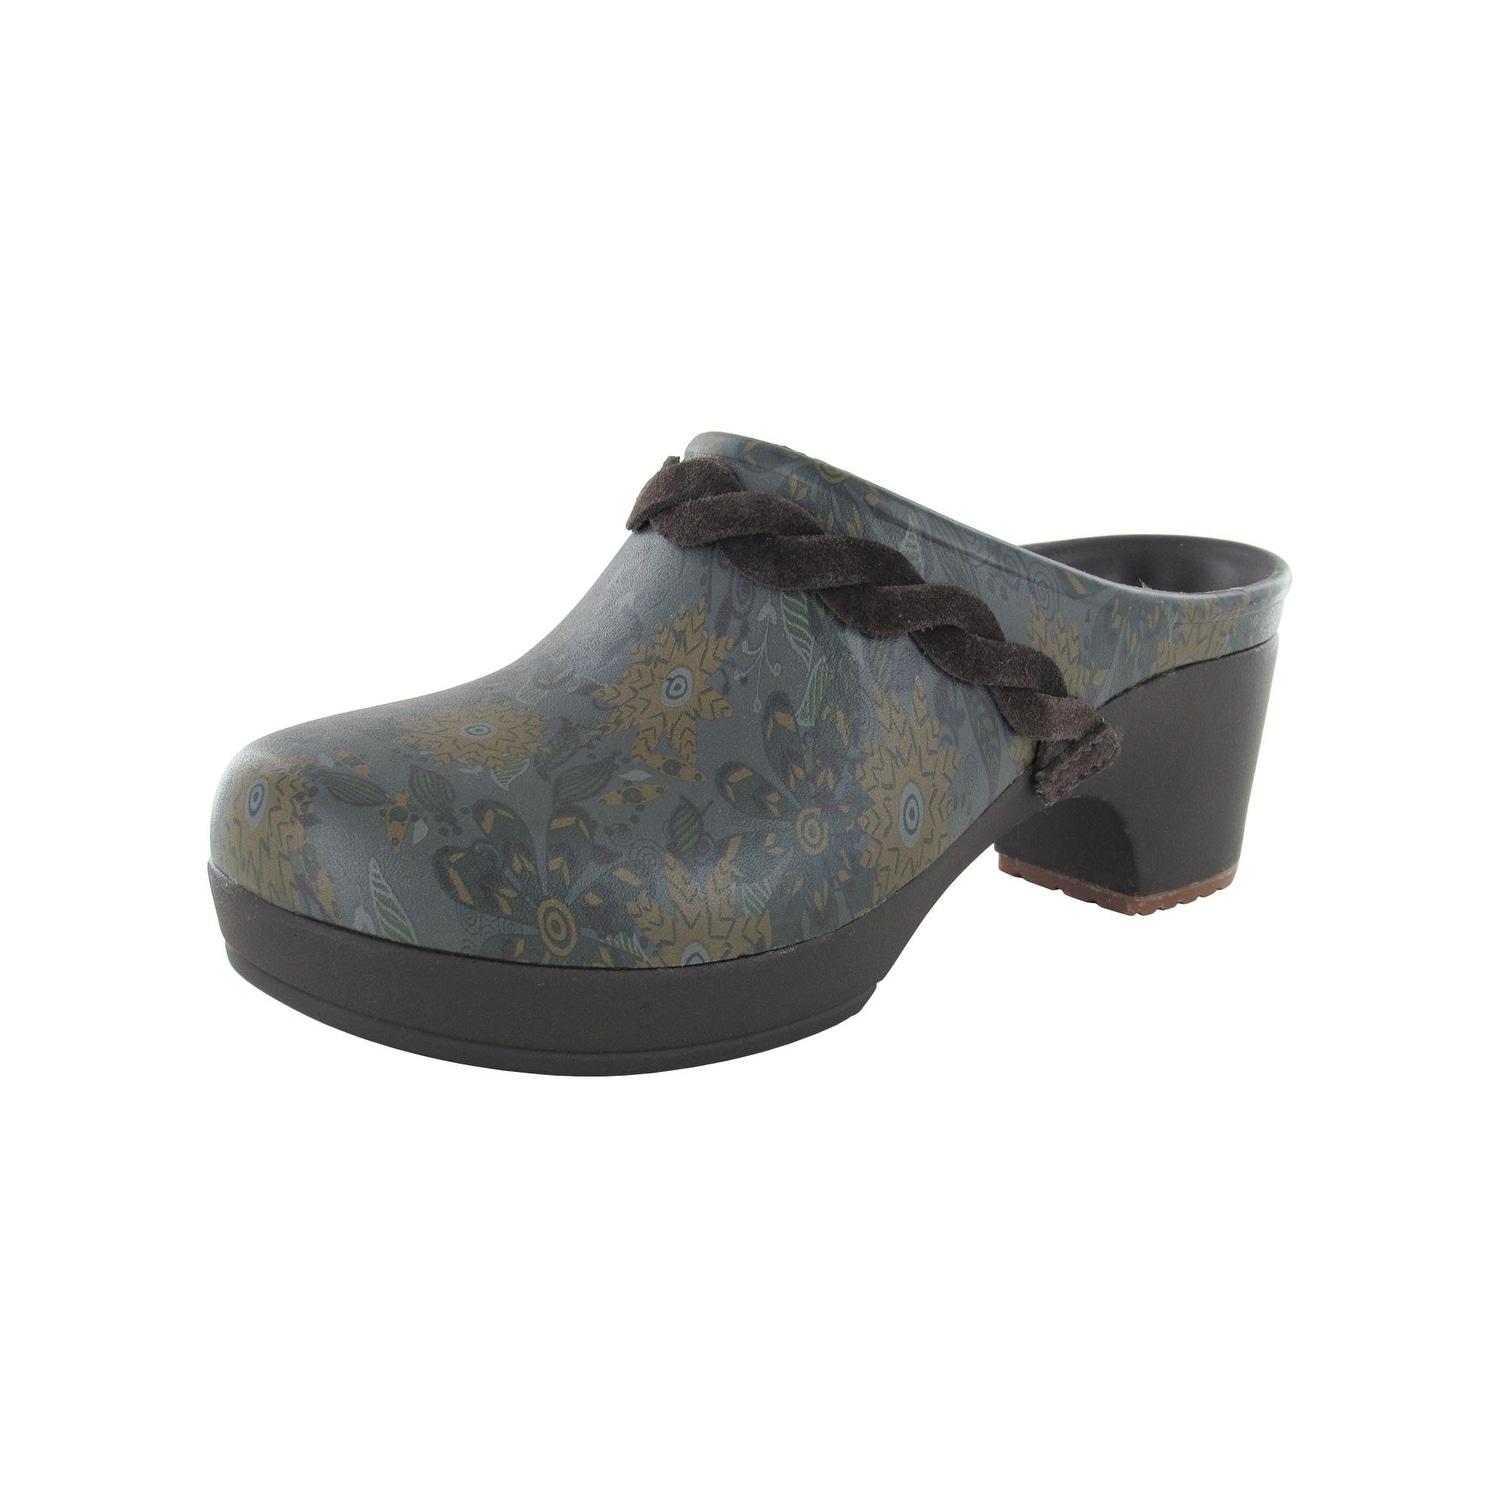 ce95ae75ac73 Crocs Shoes